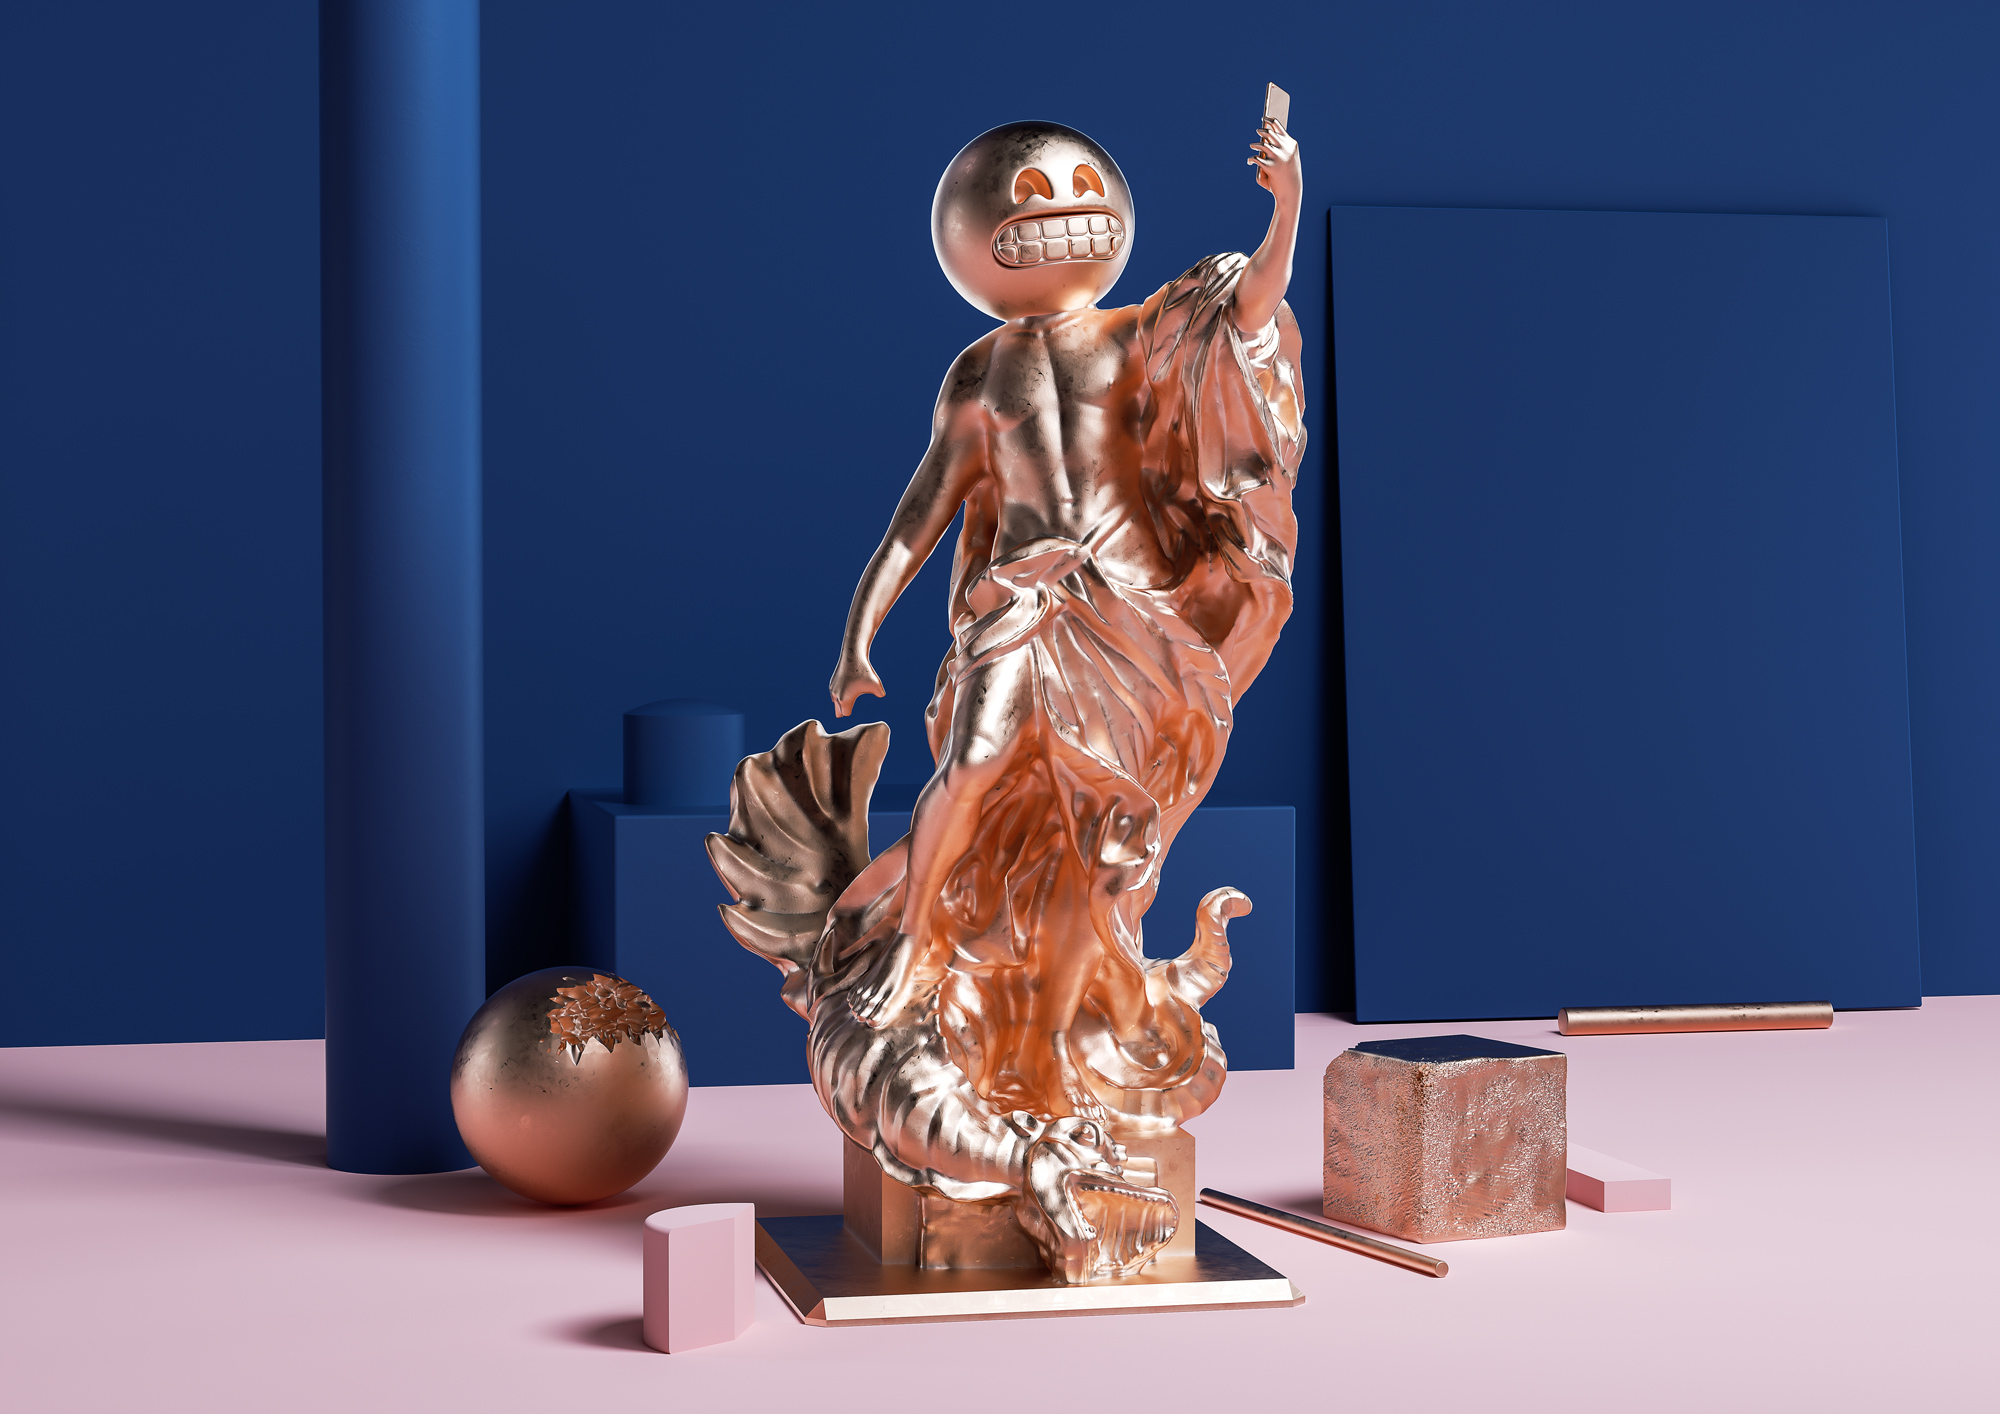 Sculptmojis_Ben-Fearnley_Scene_03.jpg